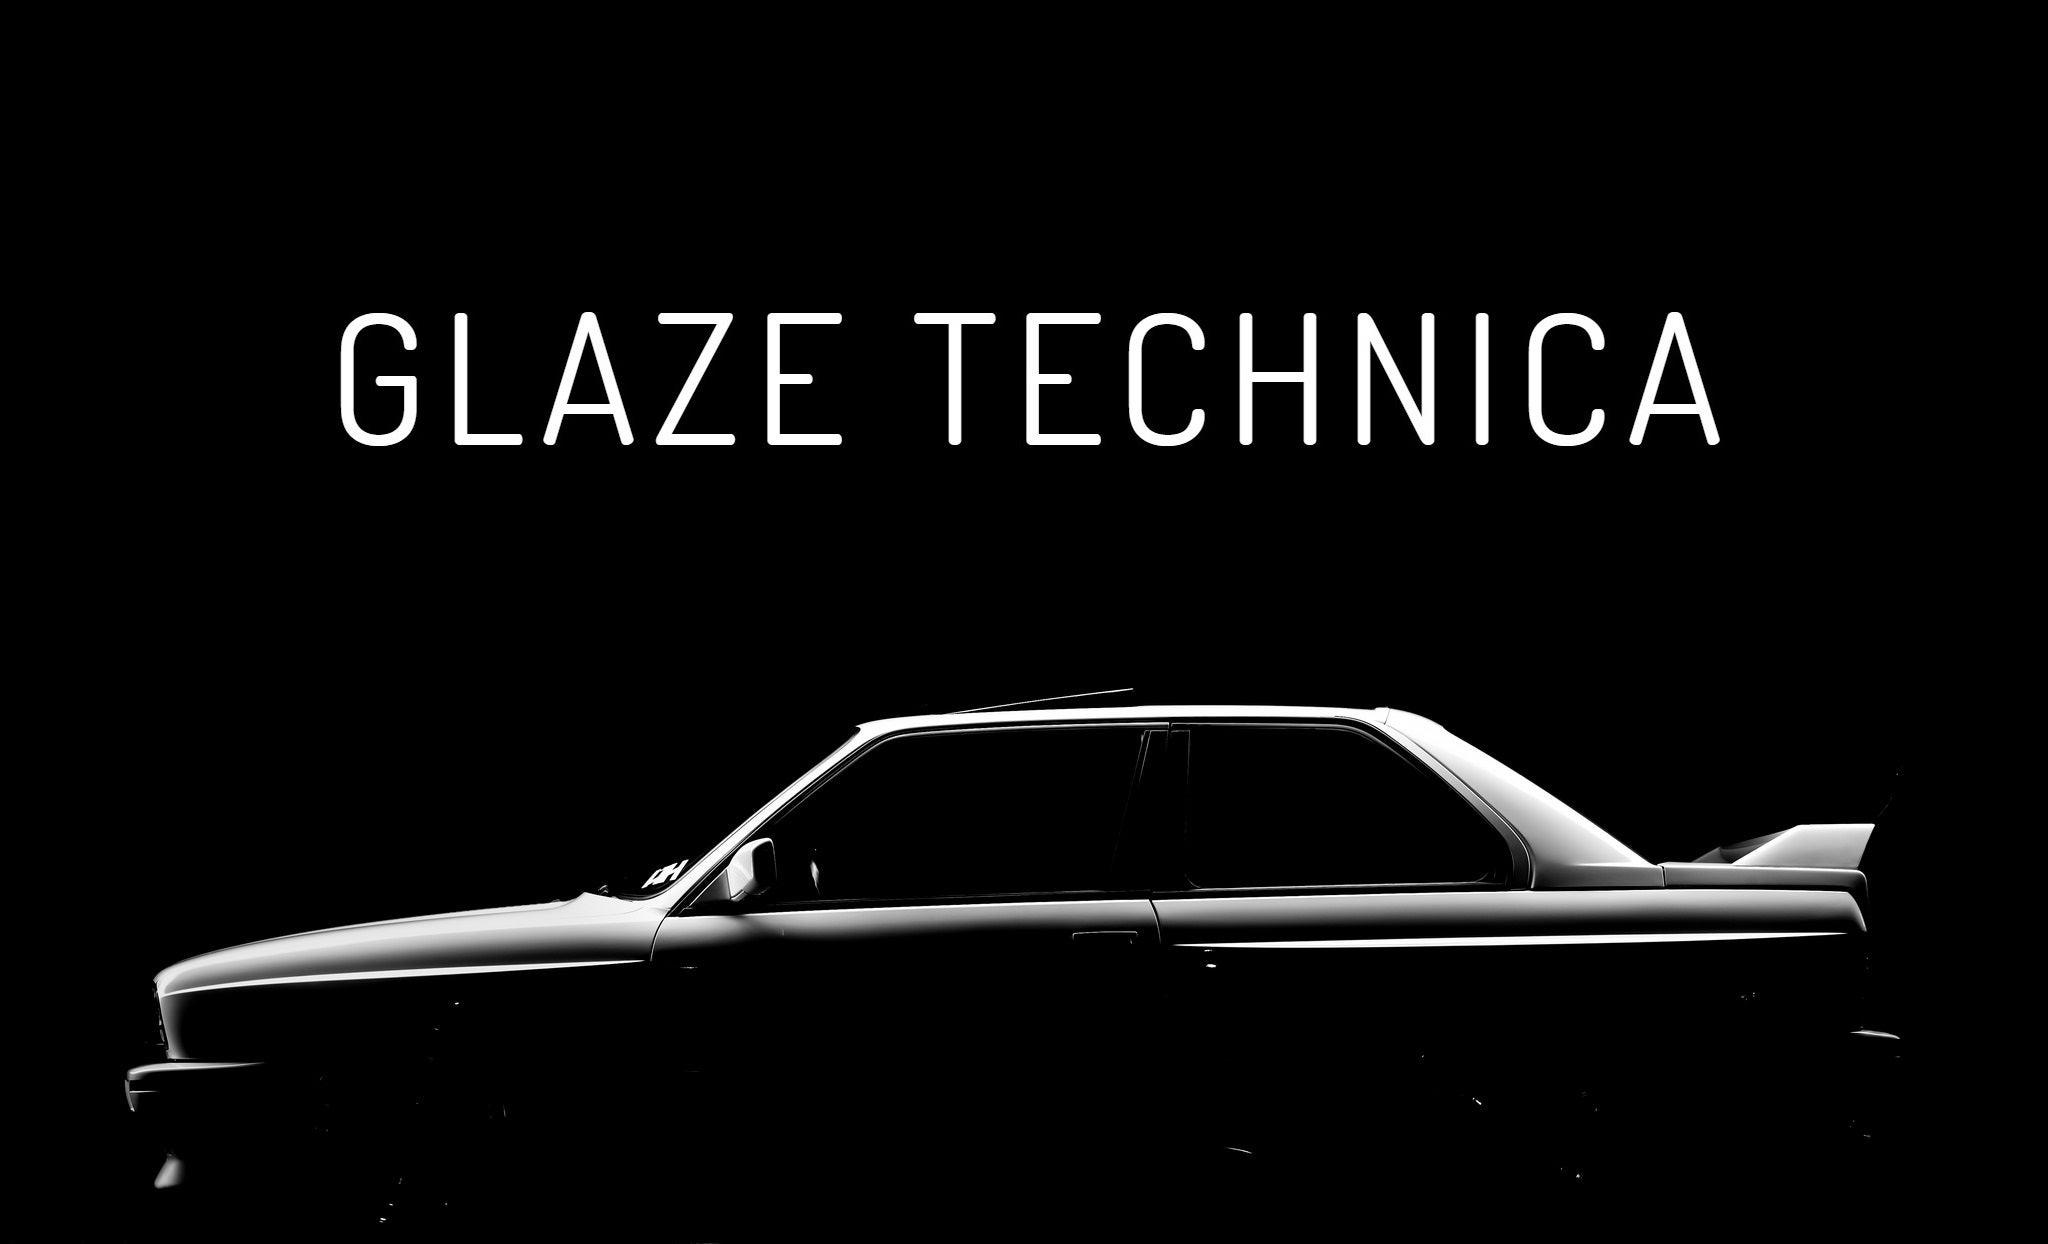 Glaze Technica